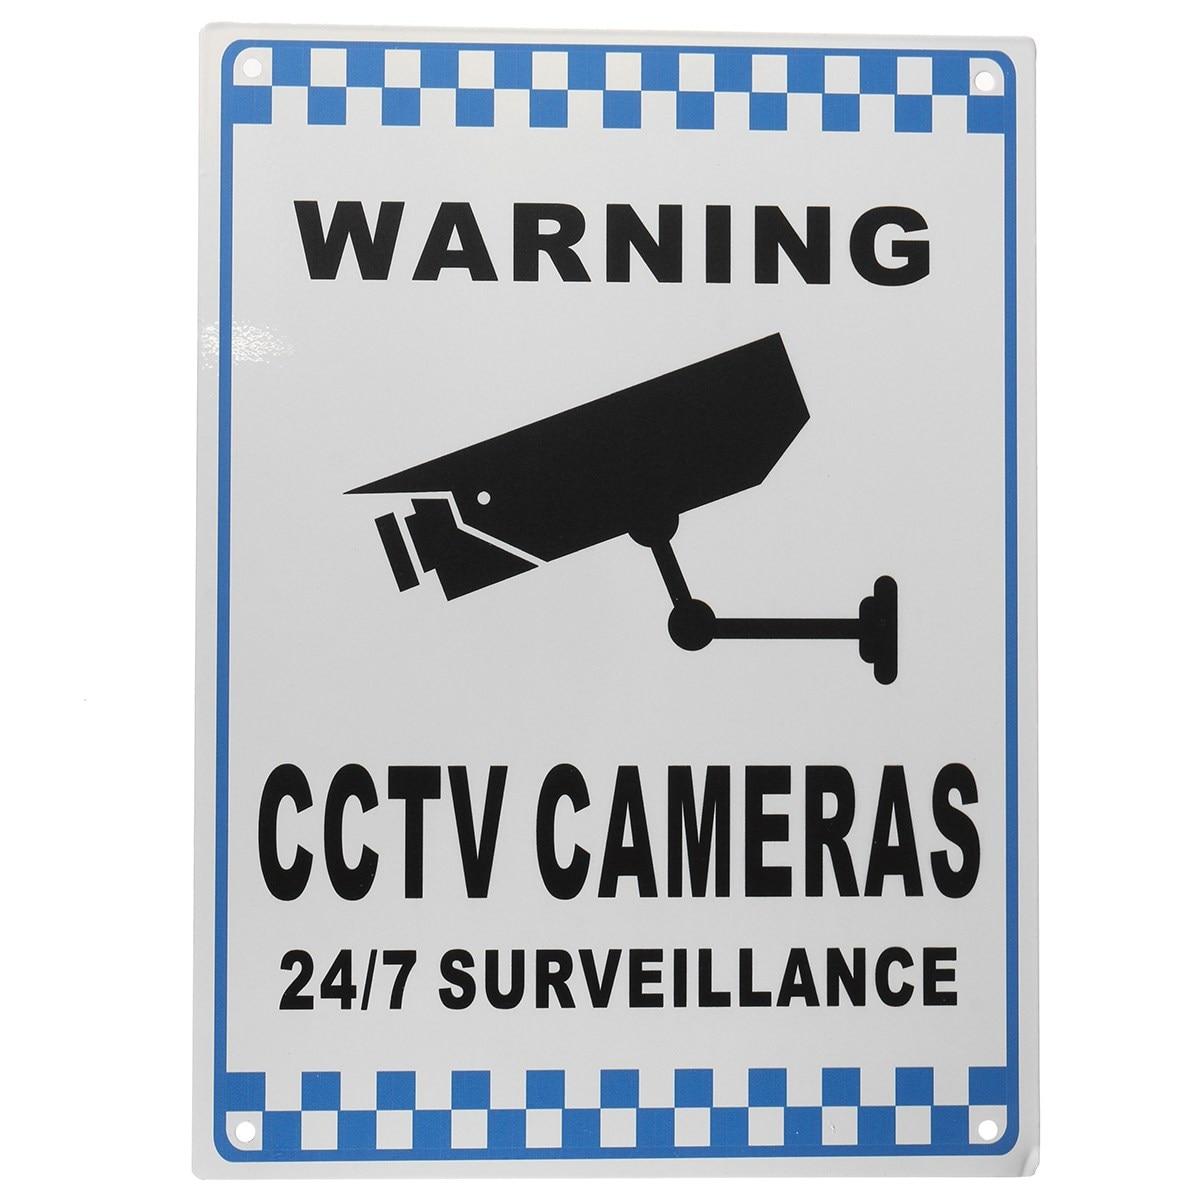 Safurance CCTV Warning Security Video Surveillance Camera Safety Sign Reflactive Metal Home Security